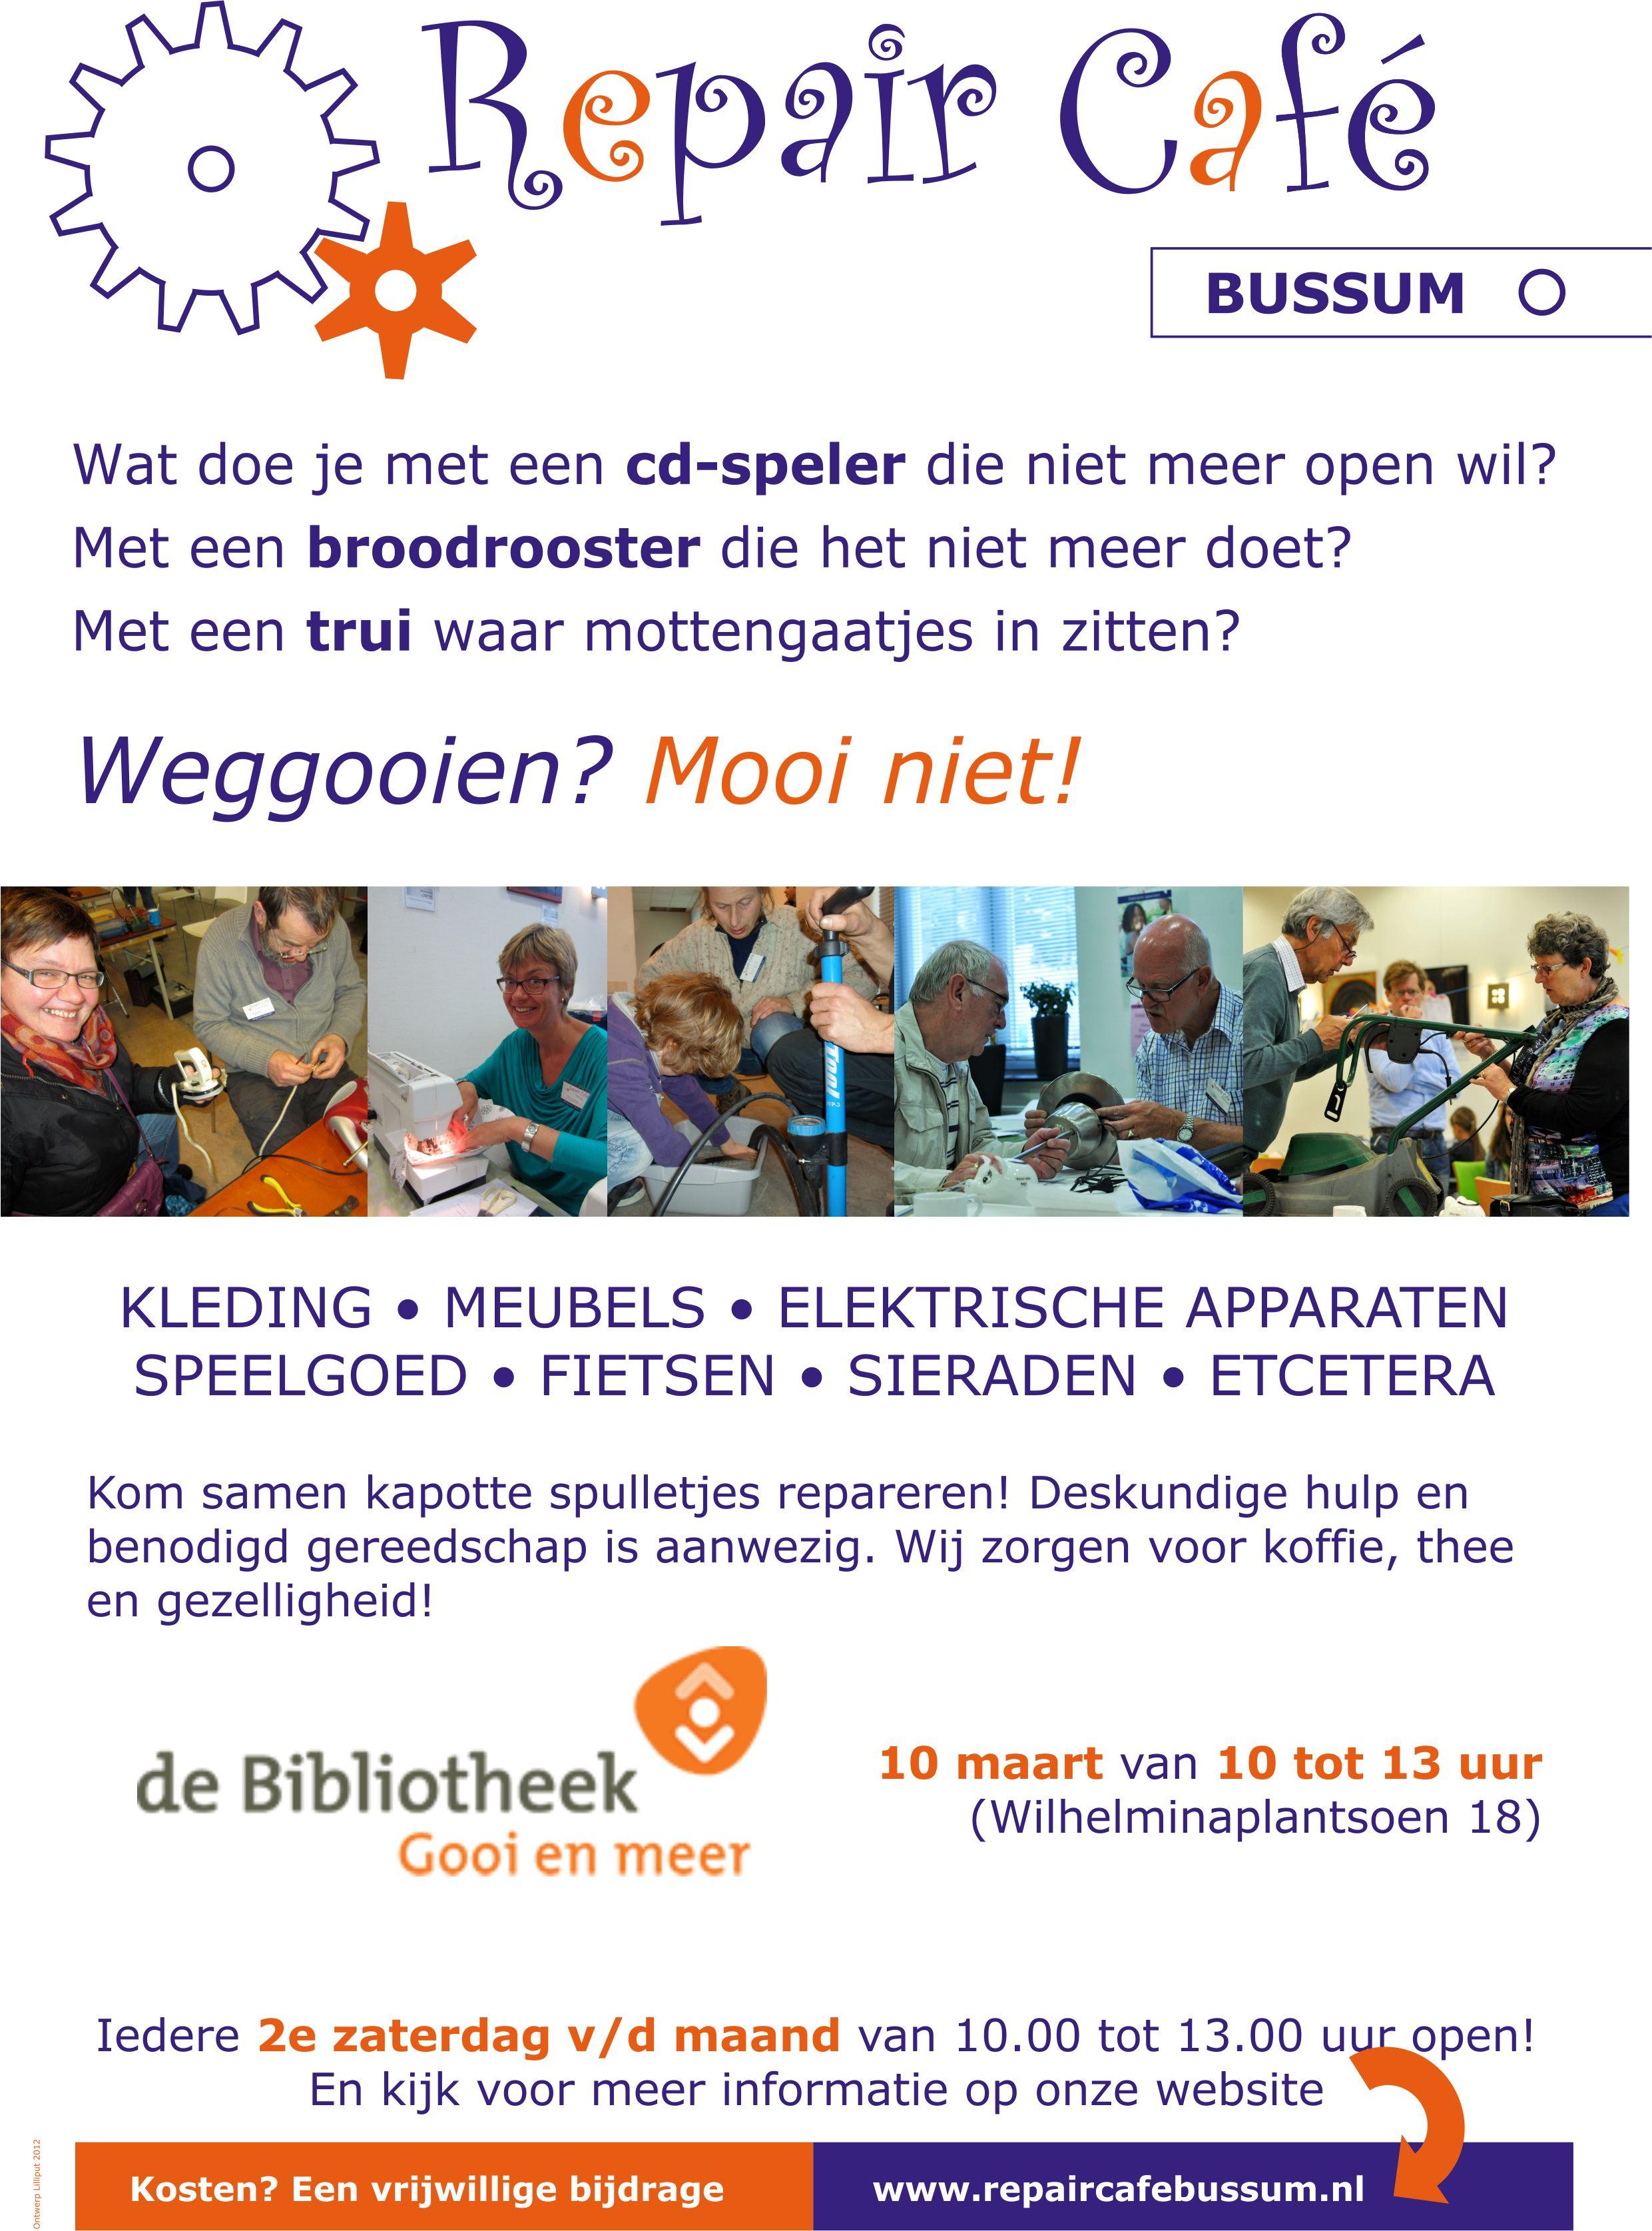 poster flyer bibliotheek mrt 2018 v3